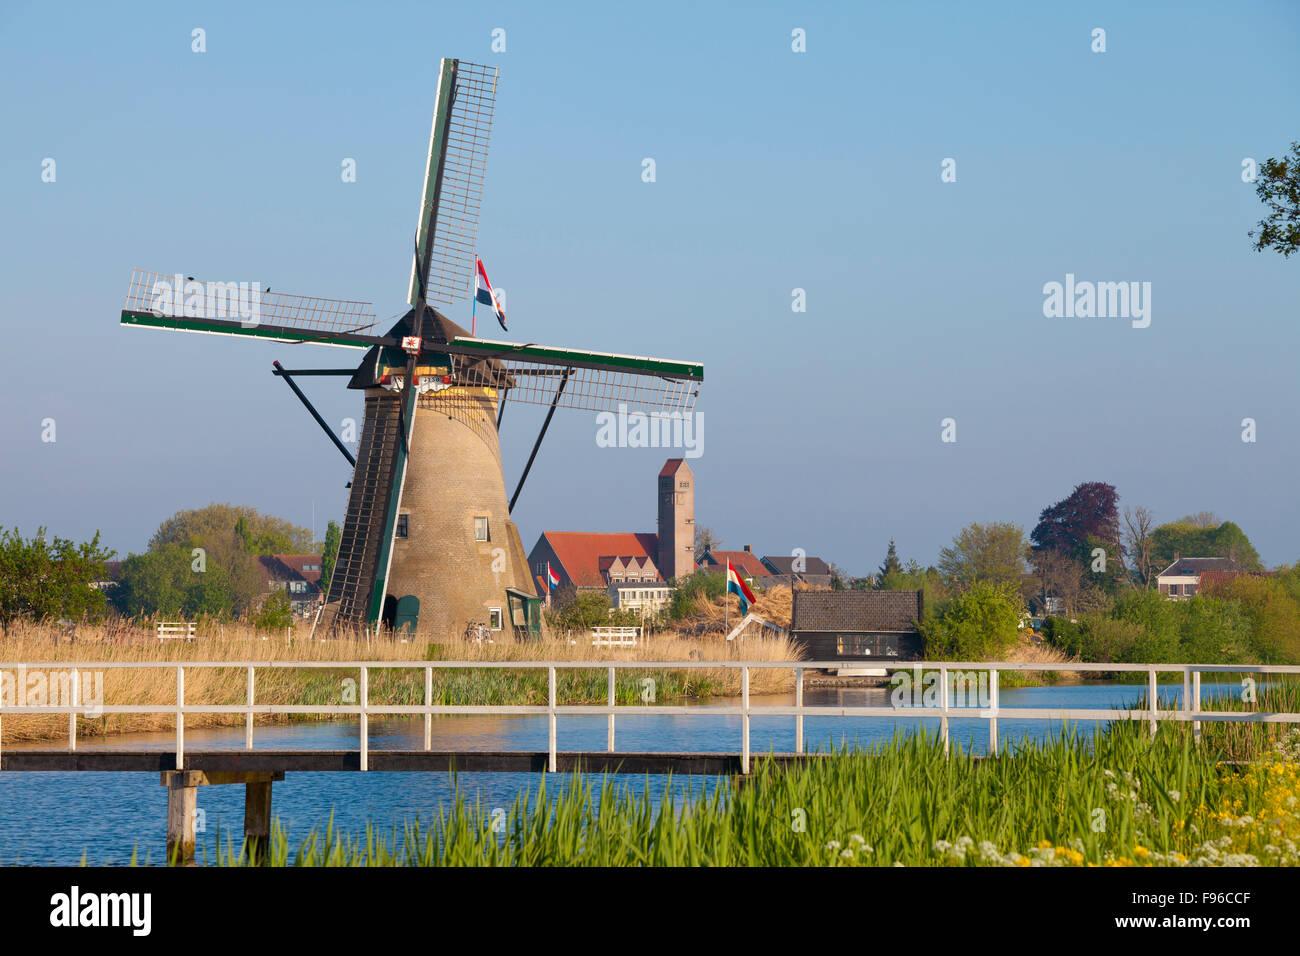 Historic Windmill at Kinderdijk, South Holland, Netherlands Stock Photo